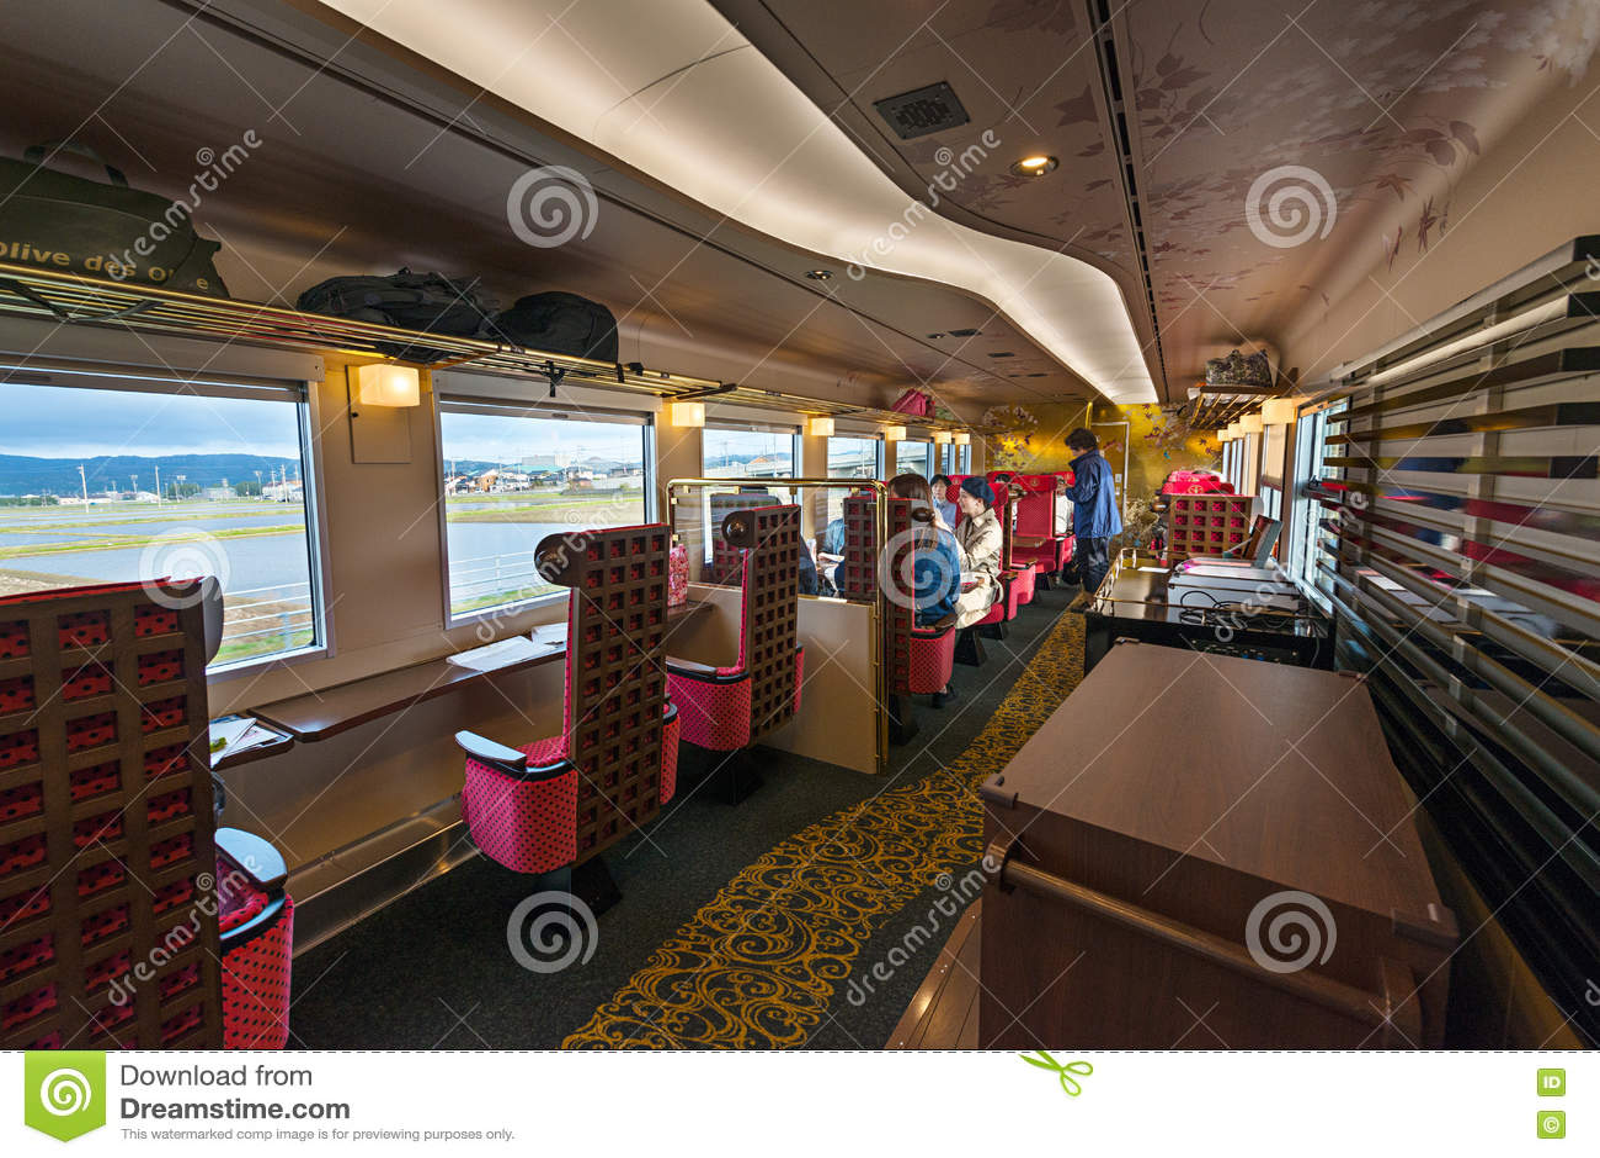 Interior of the Hanayome Noren train 2nd car.